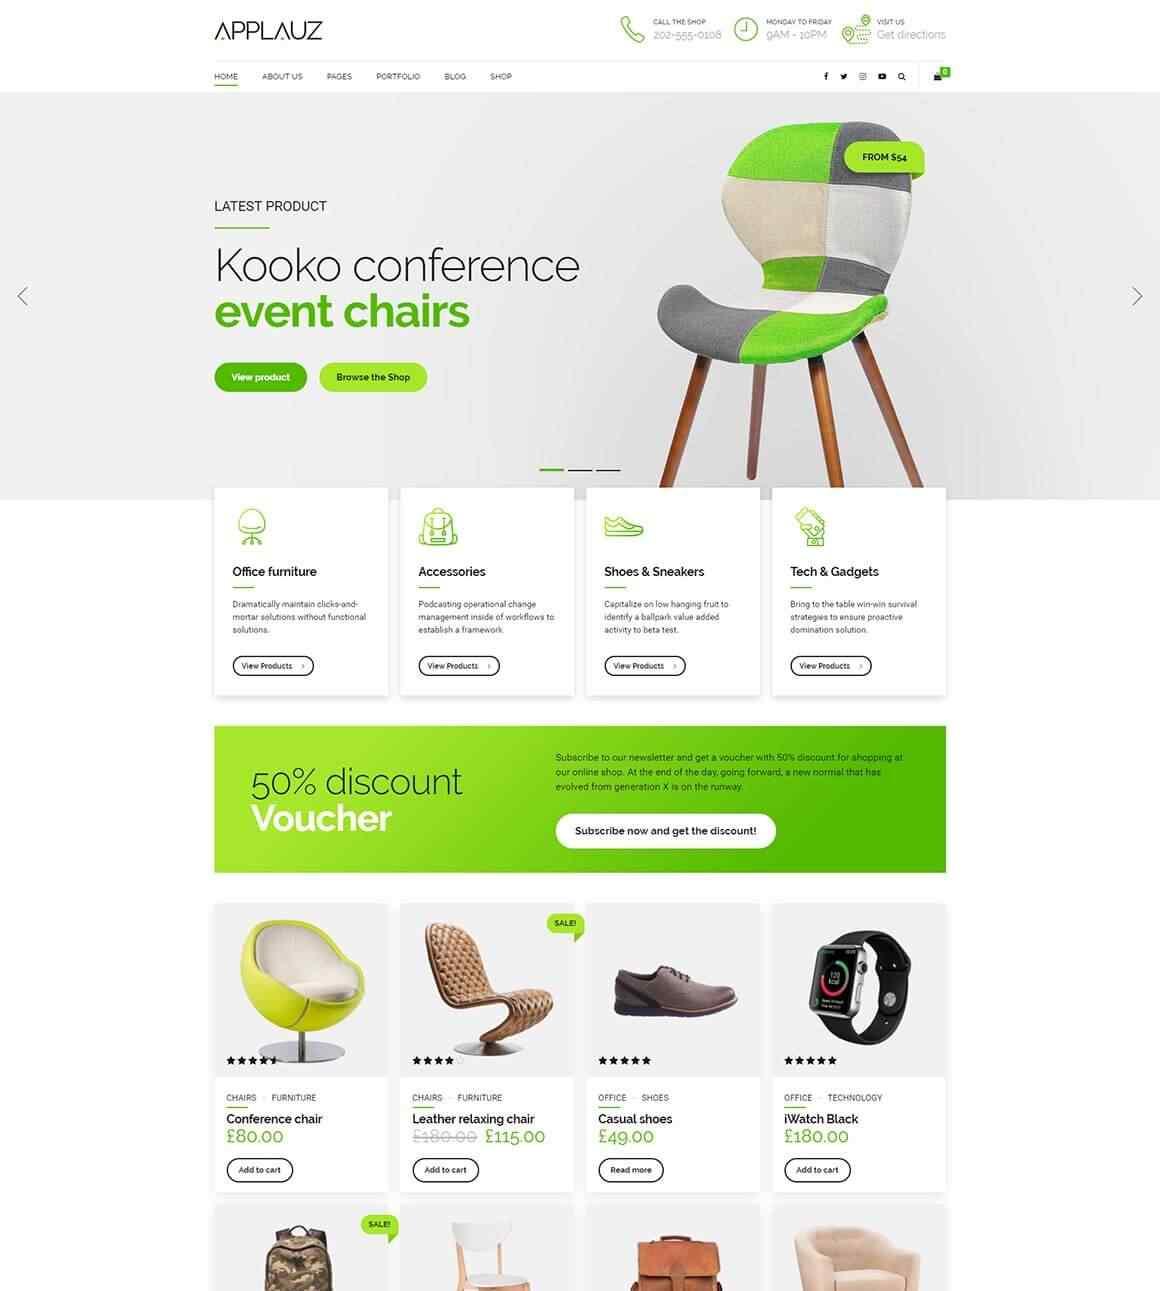 https://coretechies.com/wp-content/uploads/2017/11/Screenshot-Shop.jpg